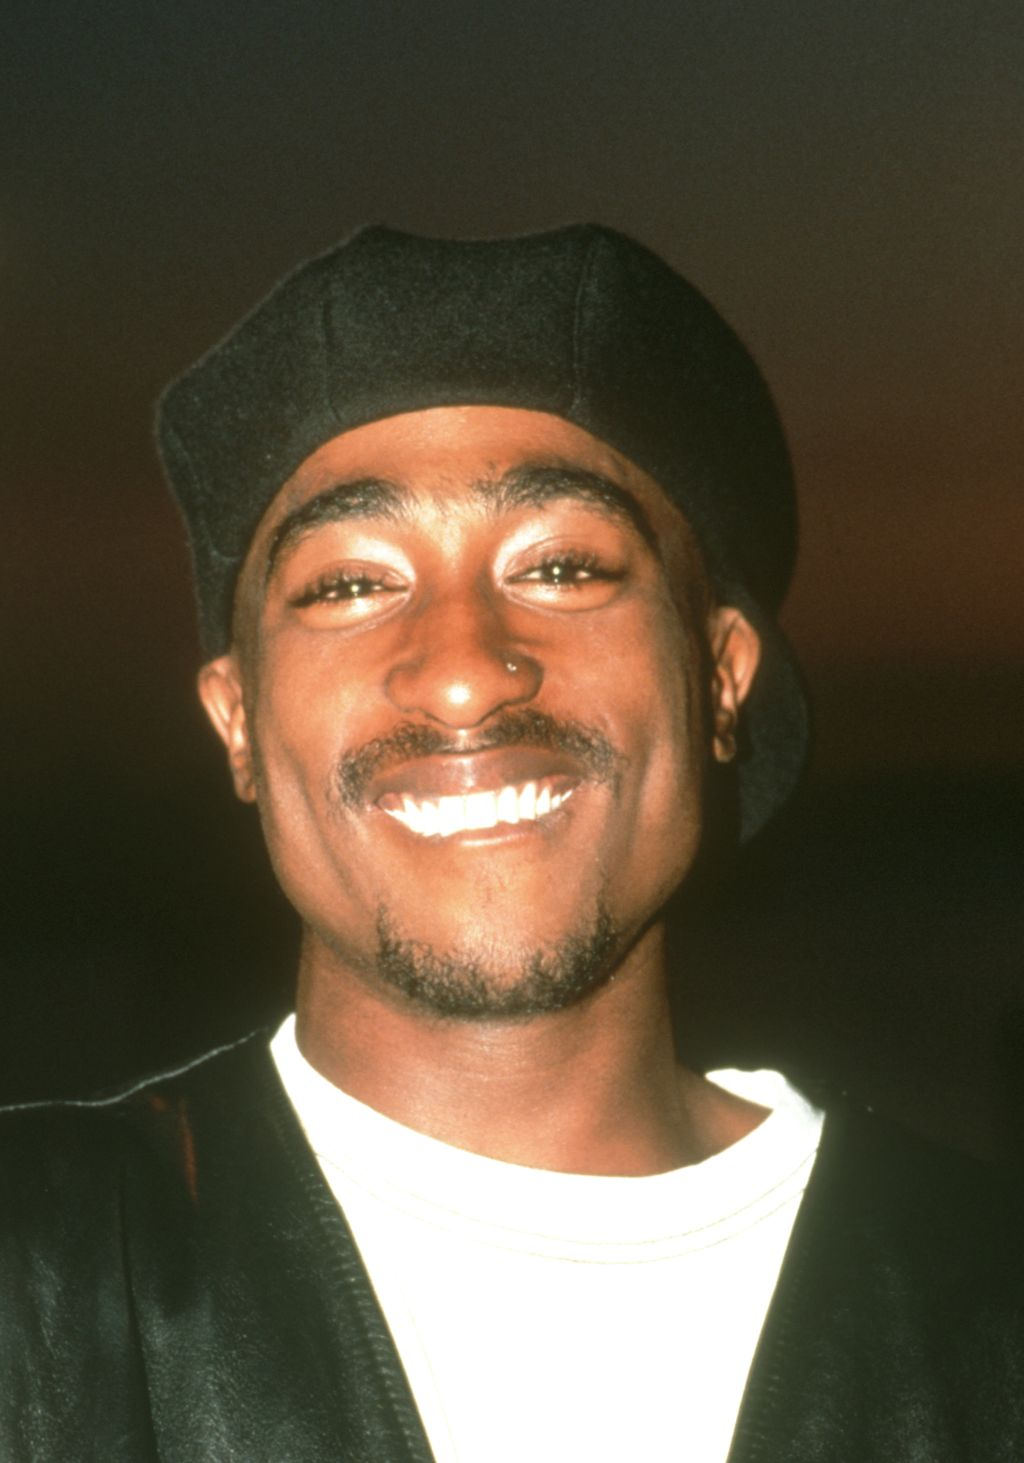 Tupac Shakur Performance At The Palladium NYC